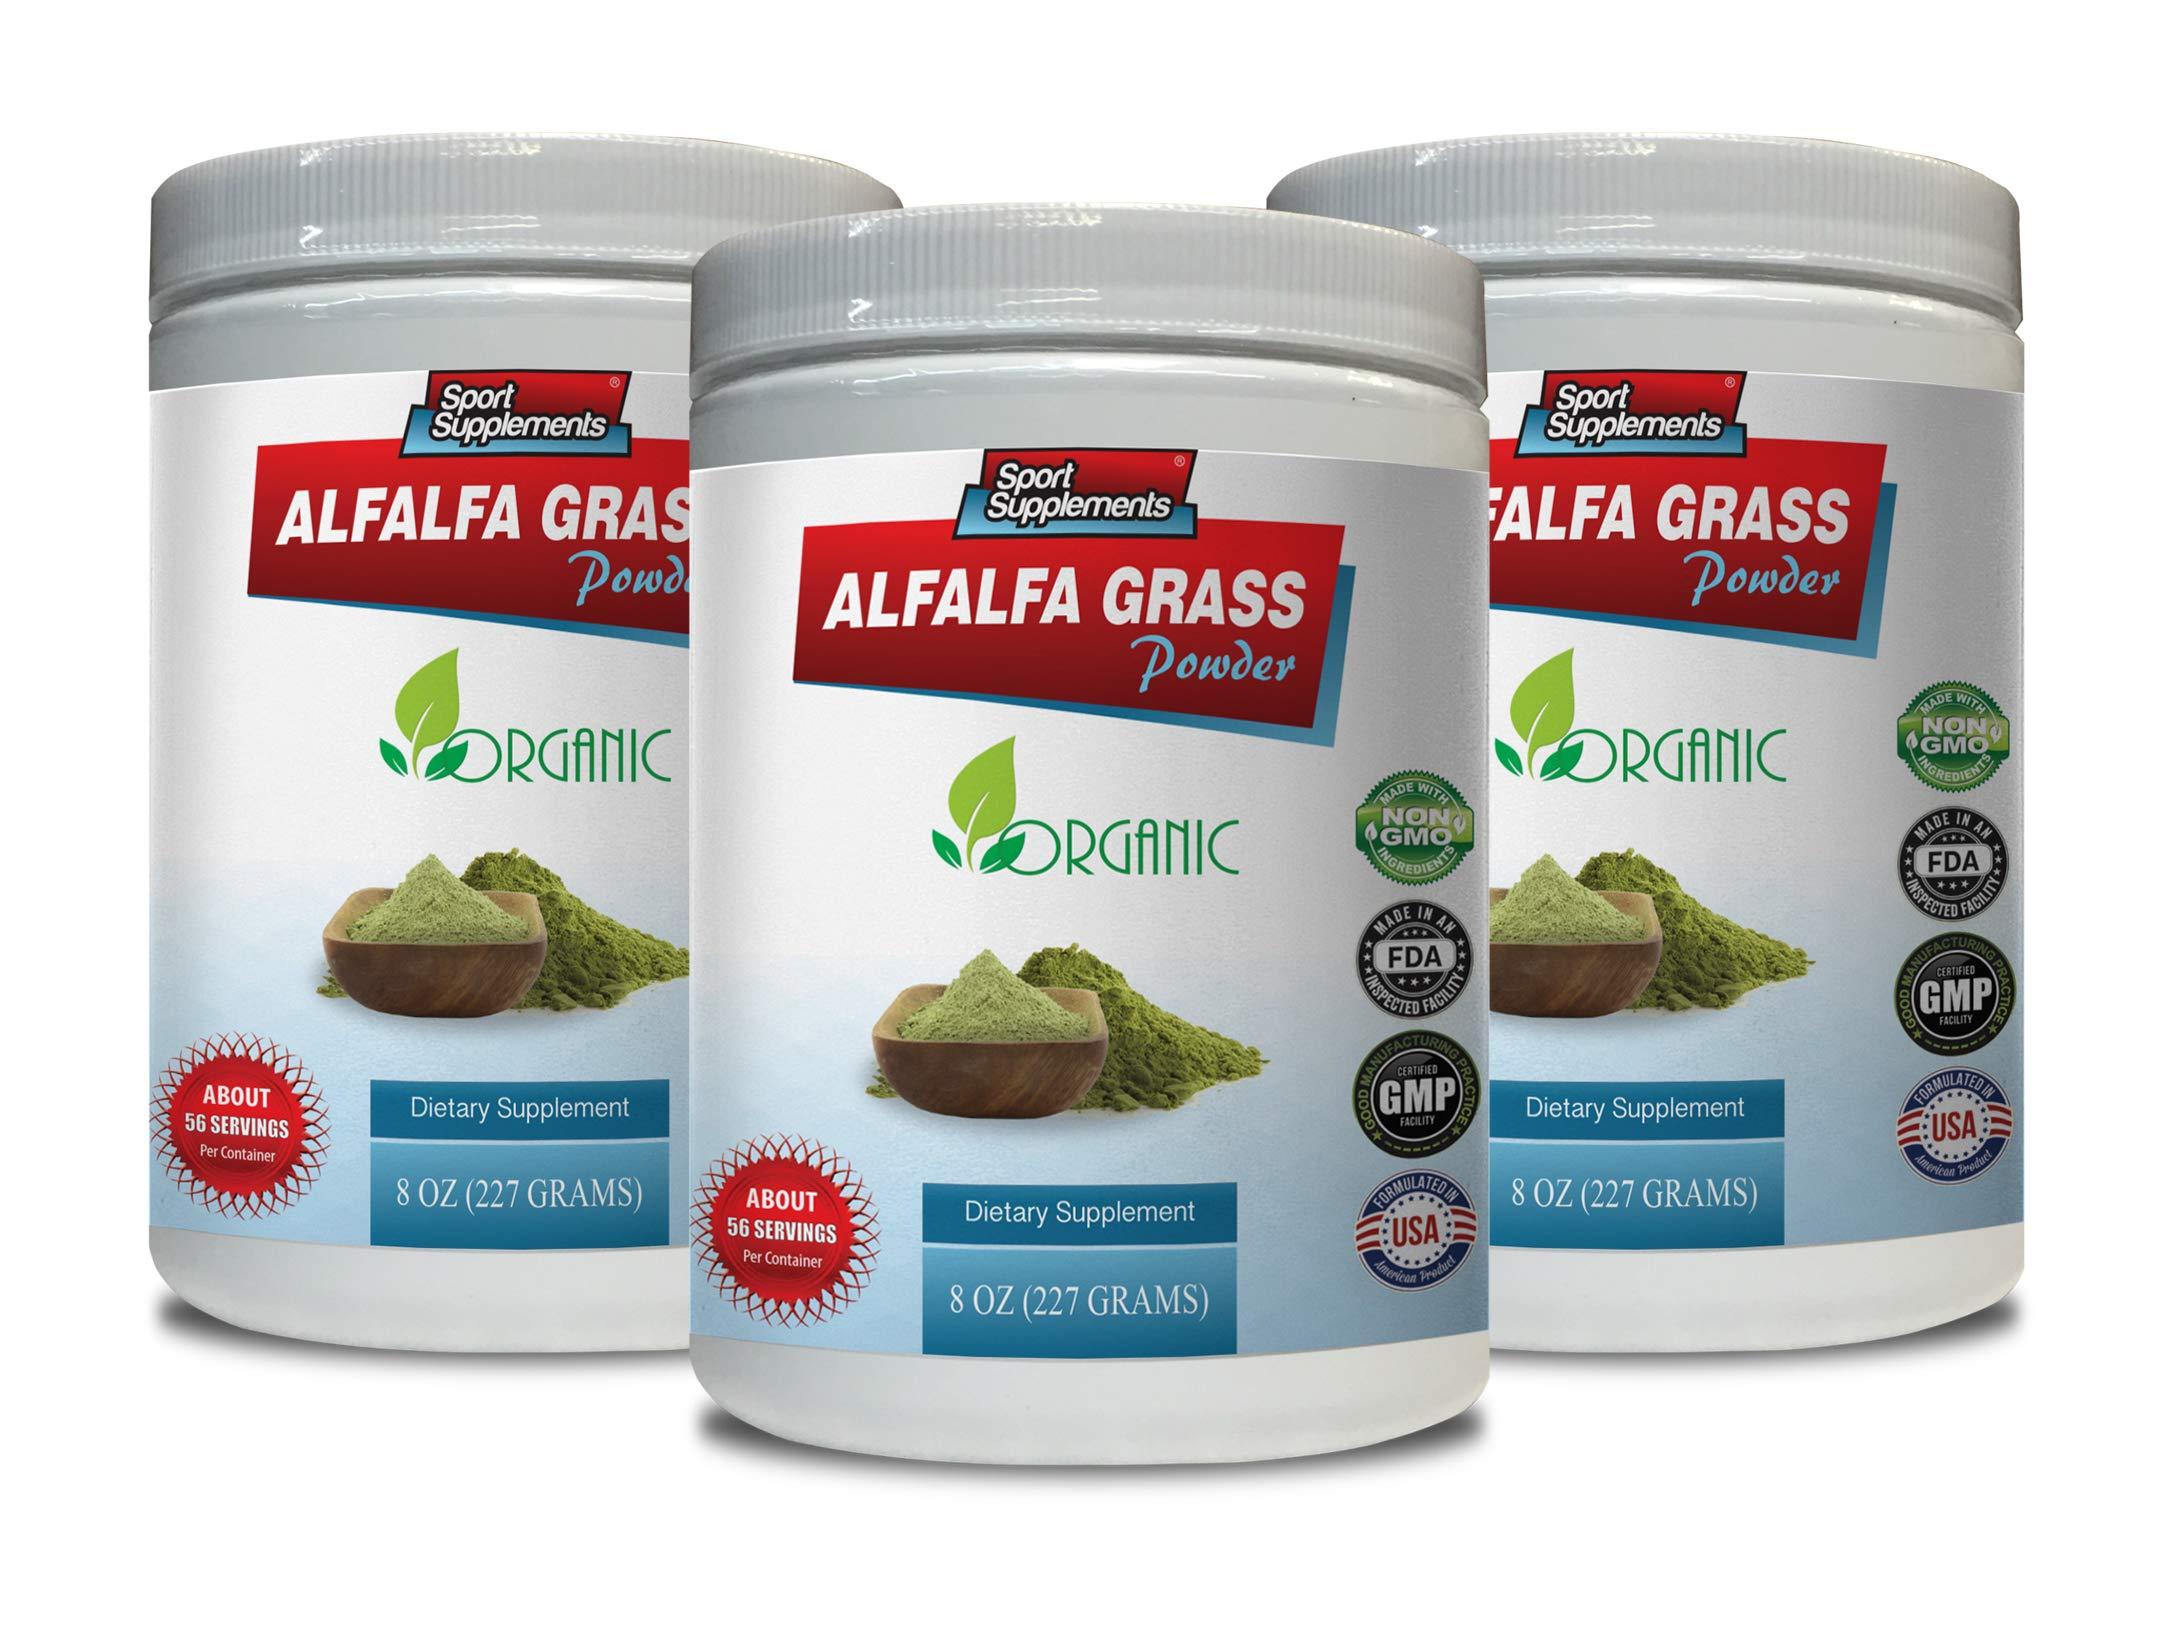 Organic Immunity Vitamins - Alfalfa Grass Powder - Organic Dietary Supplement - Digestive Powder - 3 Cans 24 OZ (168 Servings) by Sport Supplements